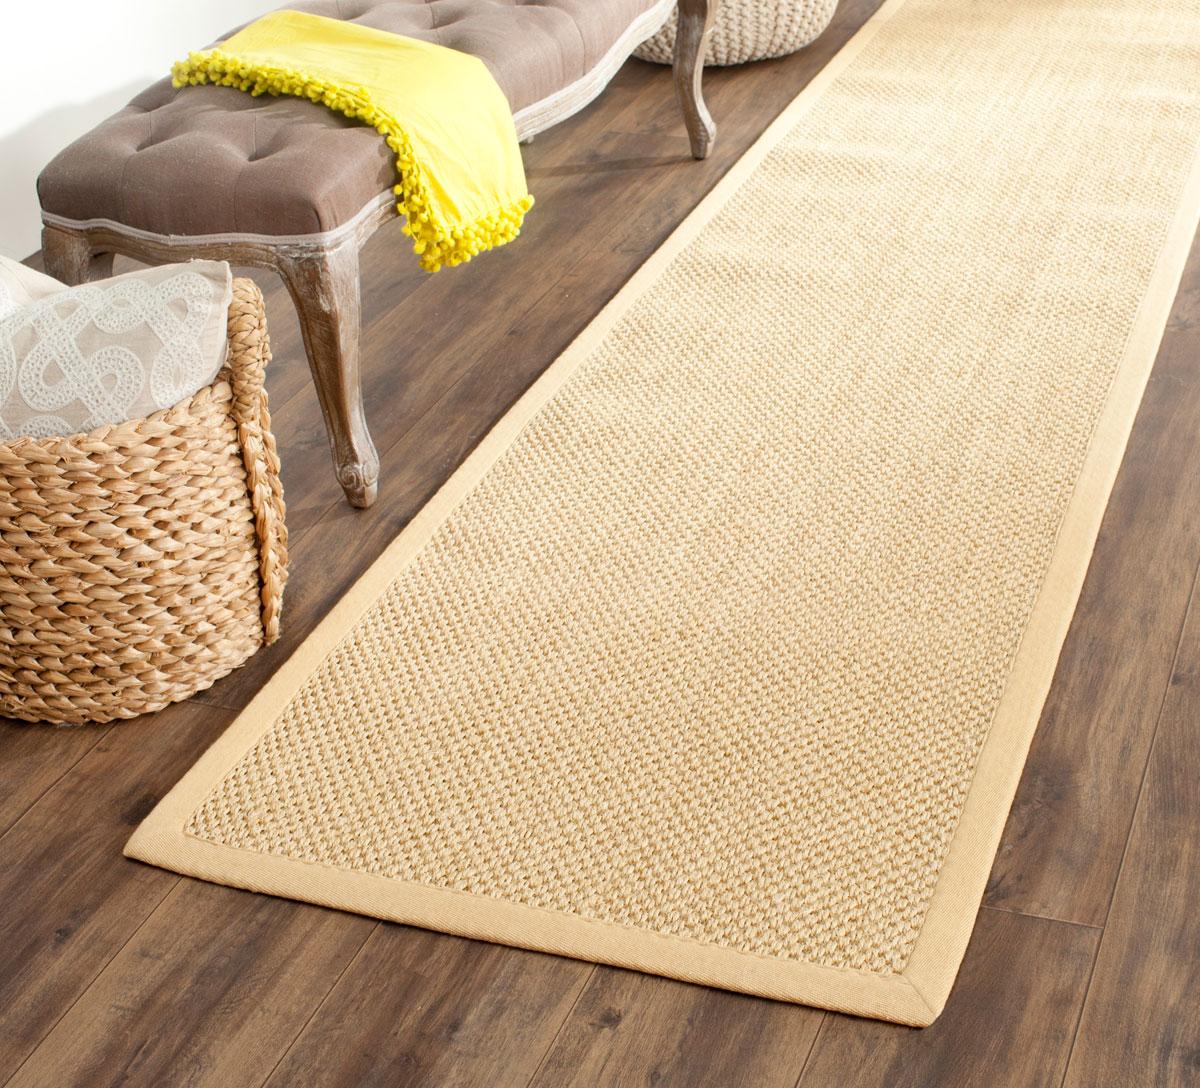 100 natural fiber area rugs natural fiber runner rugs rug d